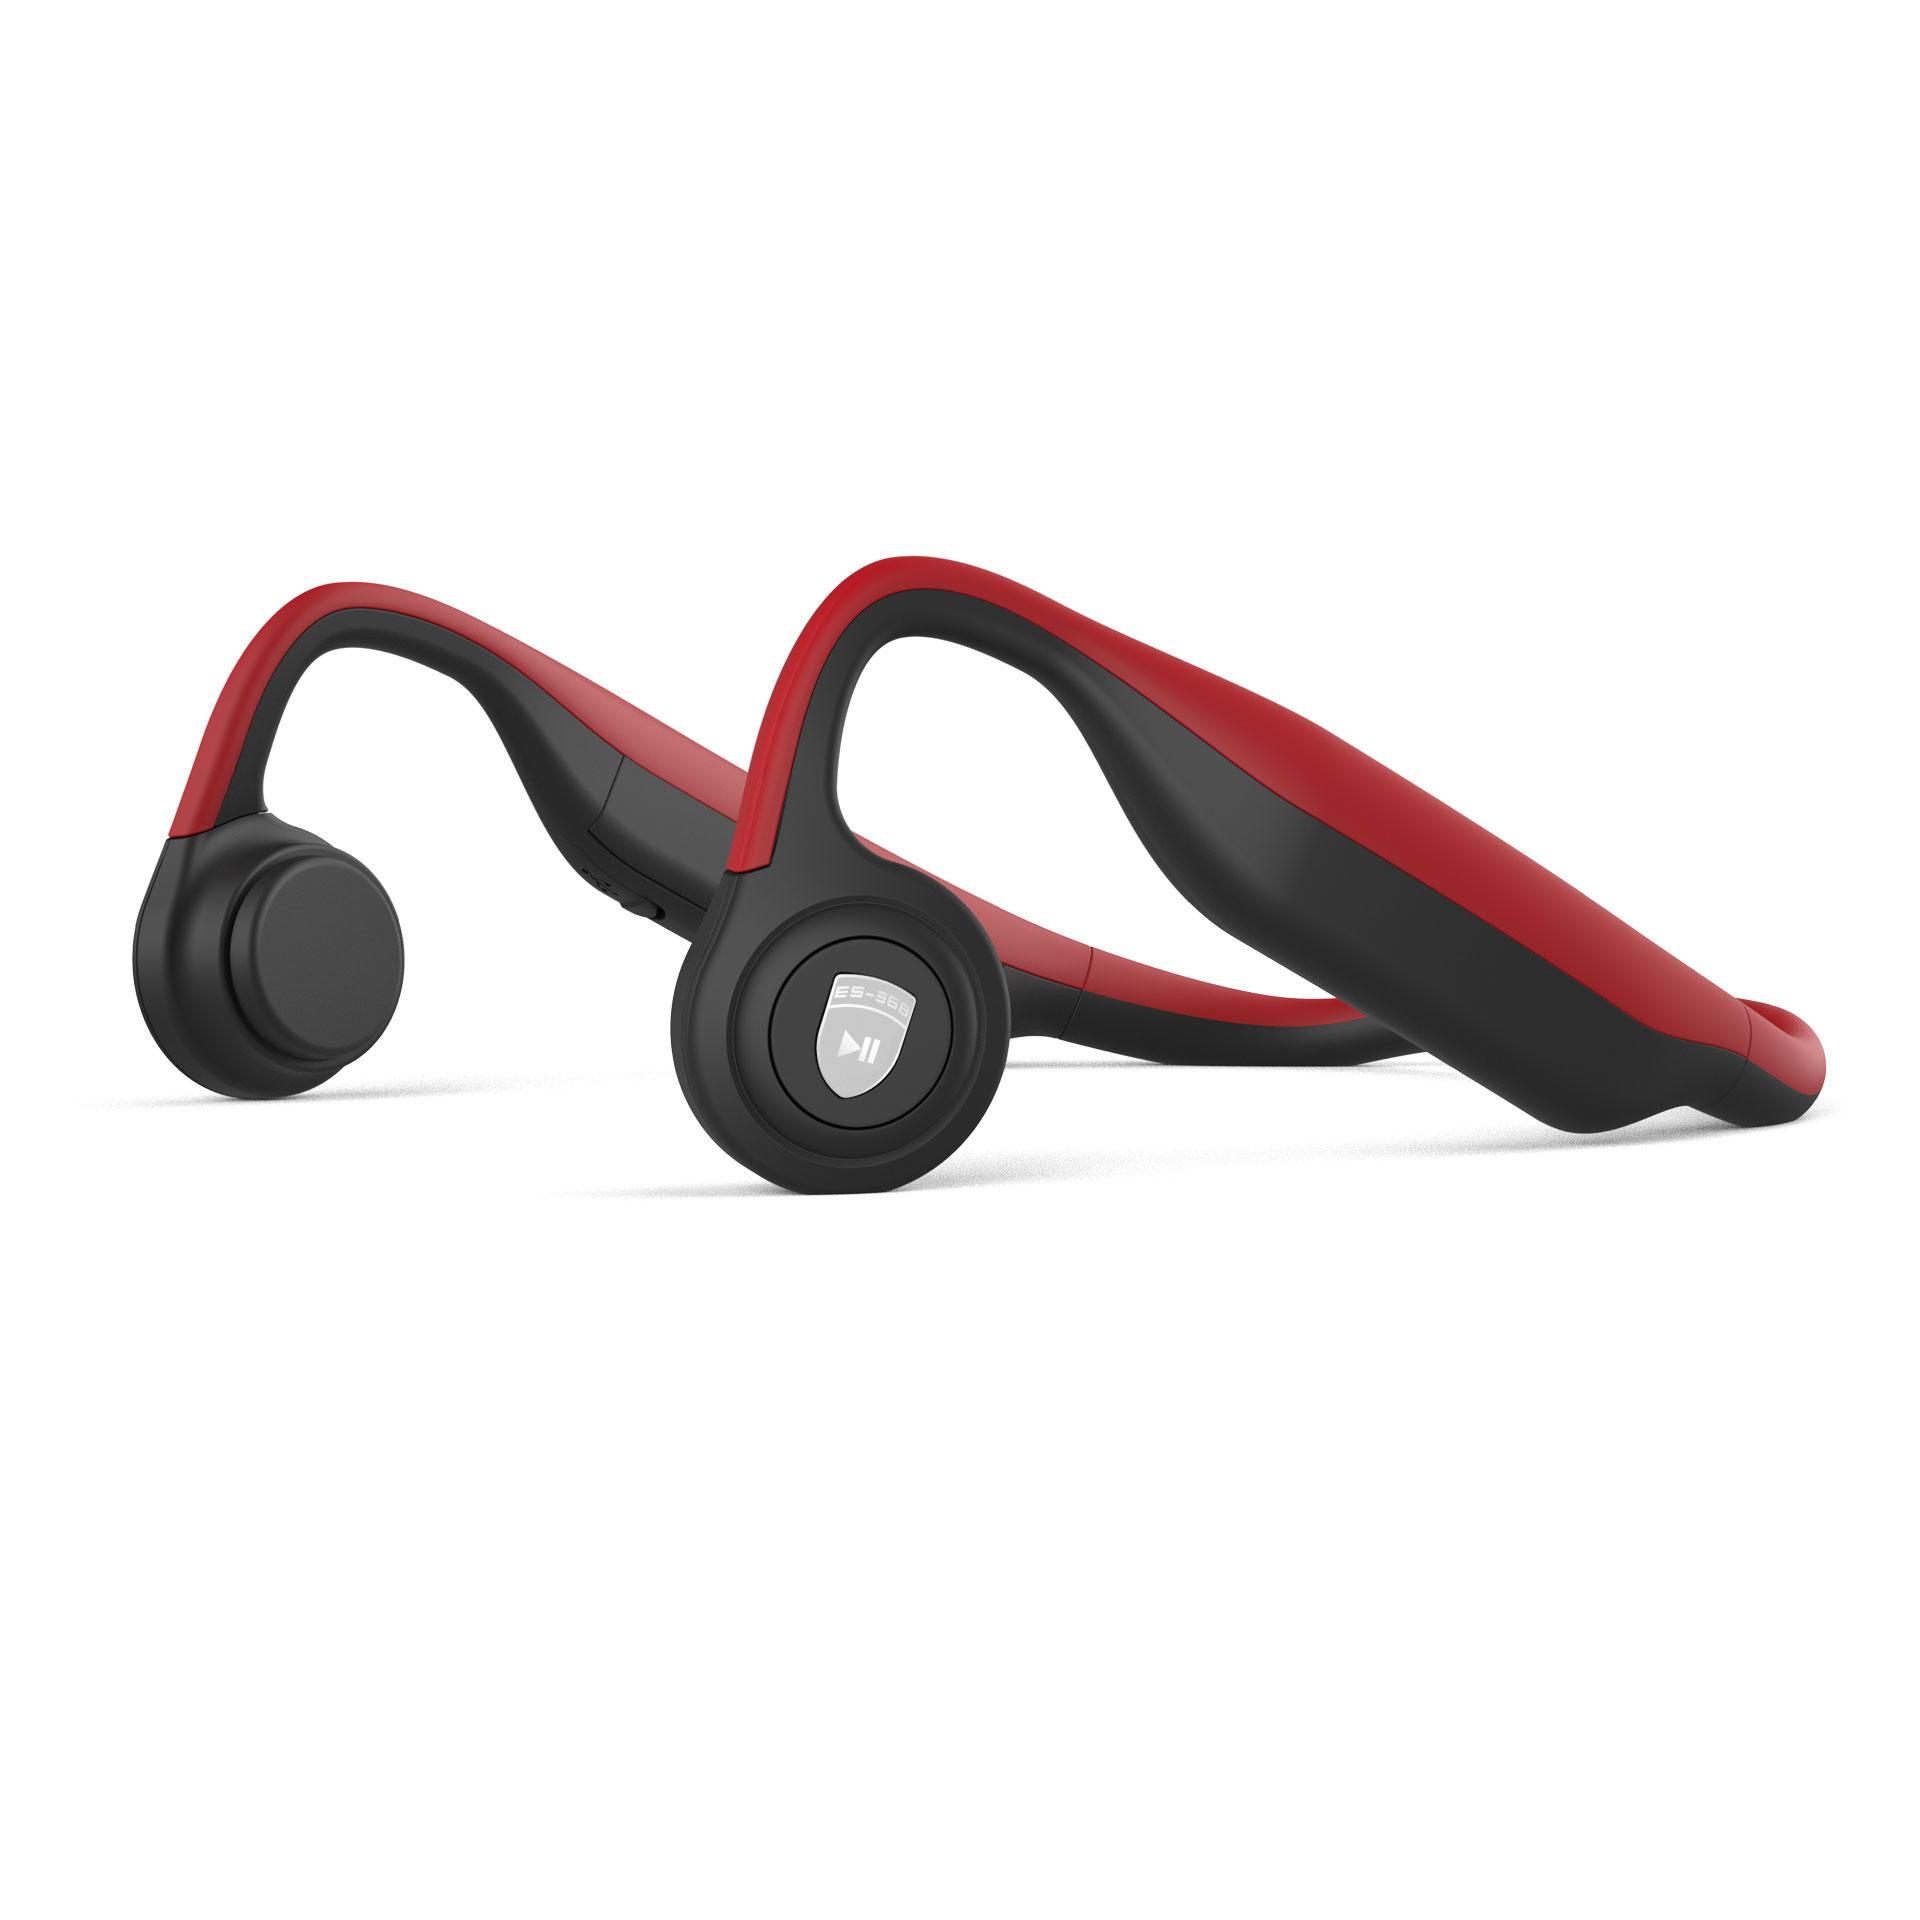 Bakeey Smart Bone Conduction Headphone Wireless bluetooth Stereo Sports Waterproof Earphone With Mic